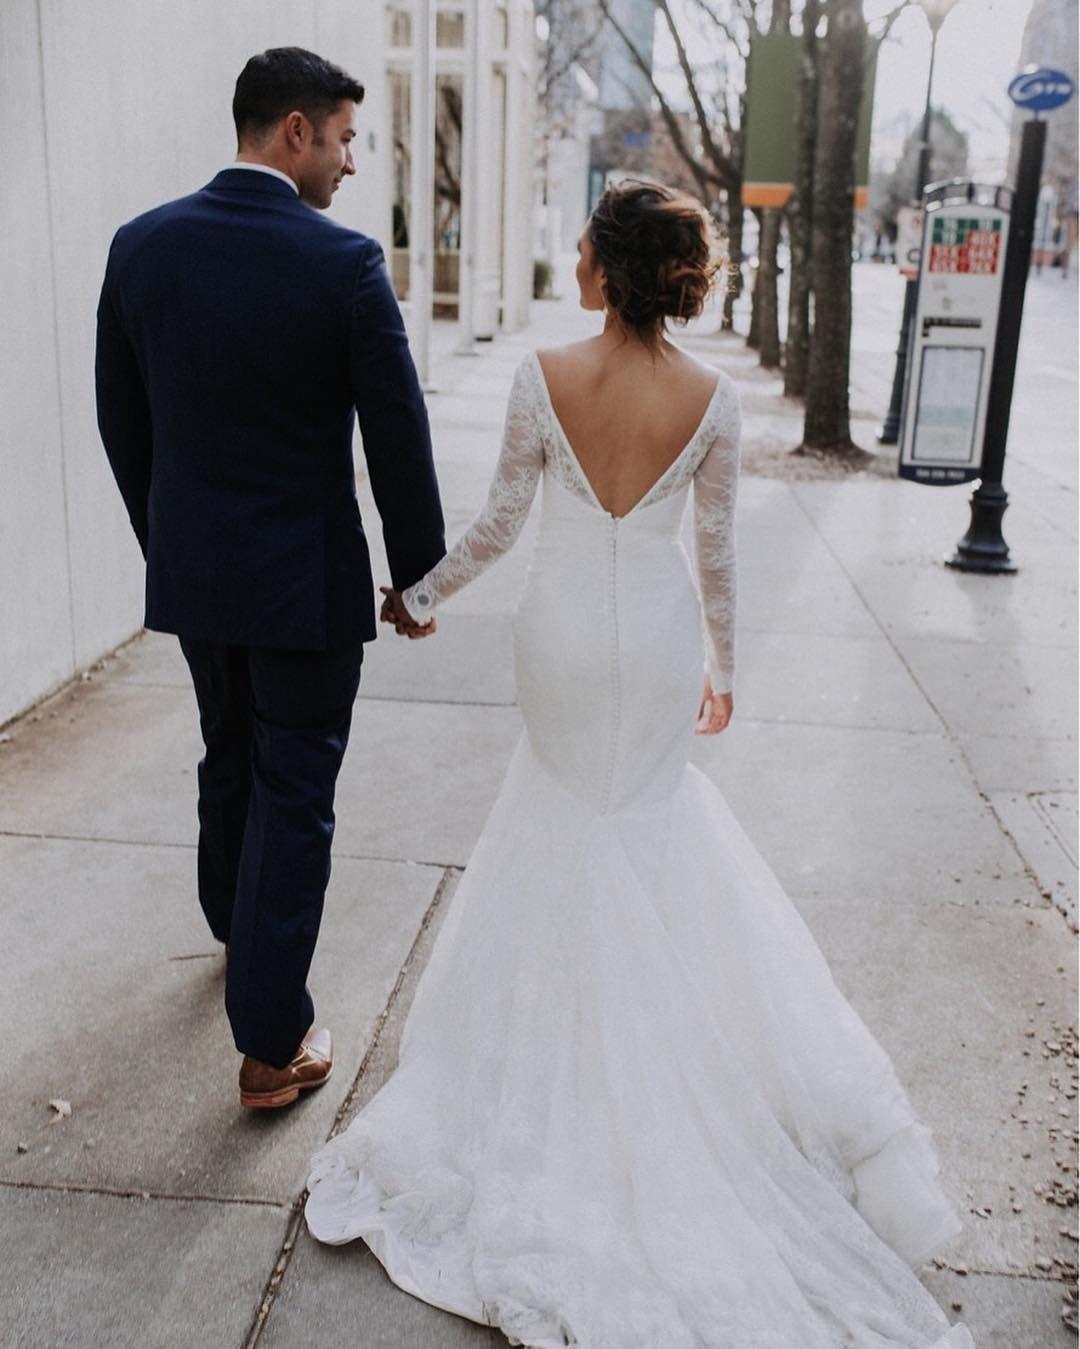 David S Bridal Bride Breanna In A Long Sleeve Lace Trumpet Truly Zac Posen Weddin Long Sleeve Wedding Dress Lace Wedding Gowns Lace Top Wedding Dress Designers [ 1349 x 1080 Pixel ]